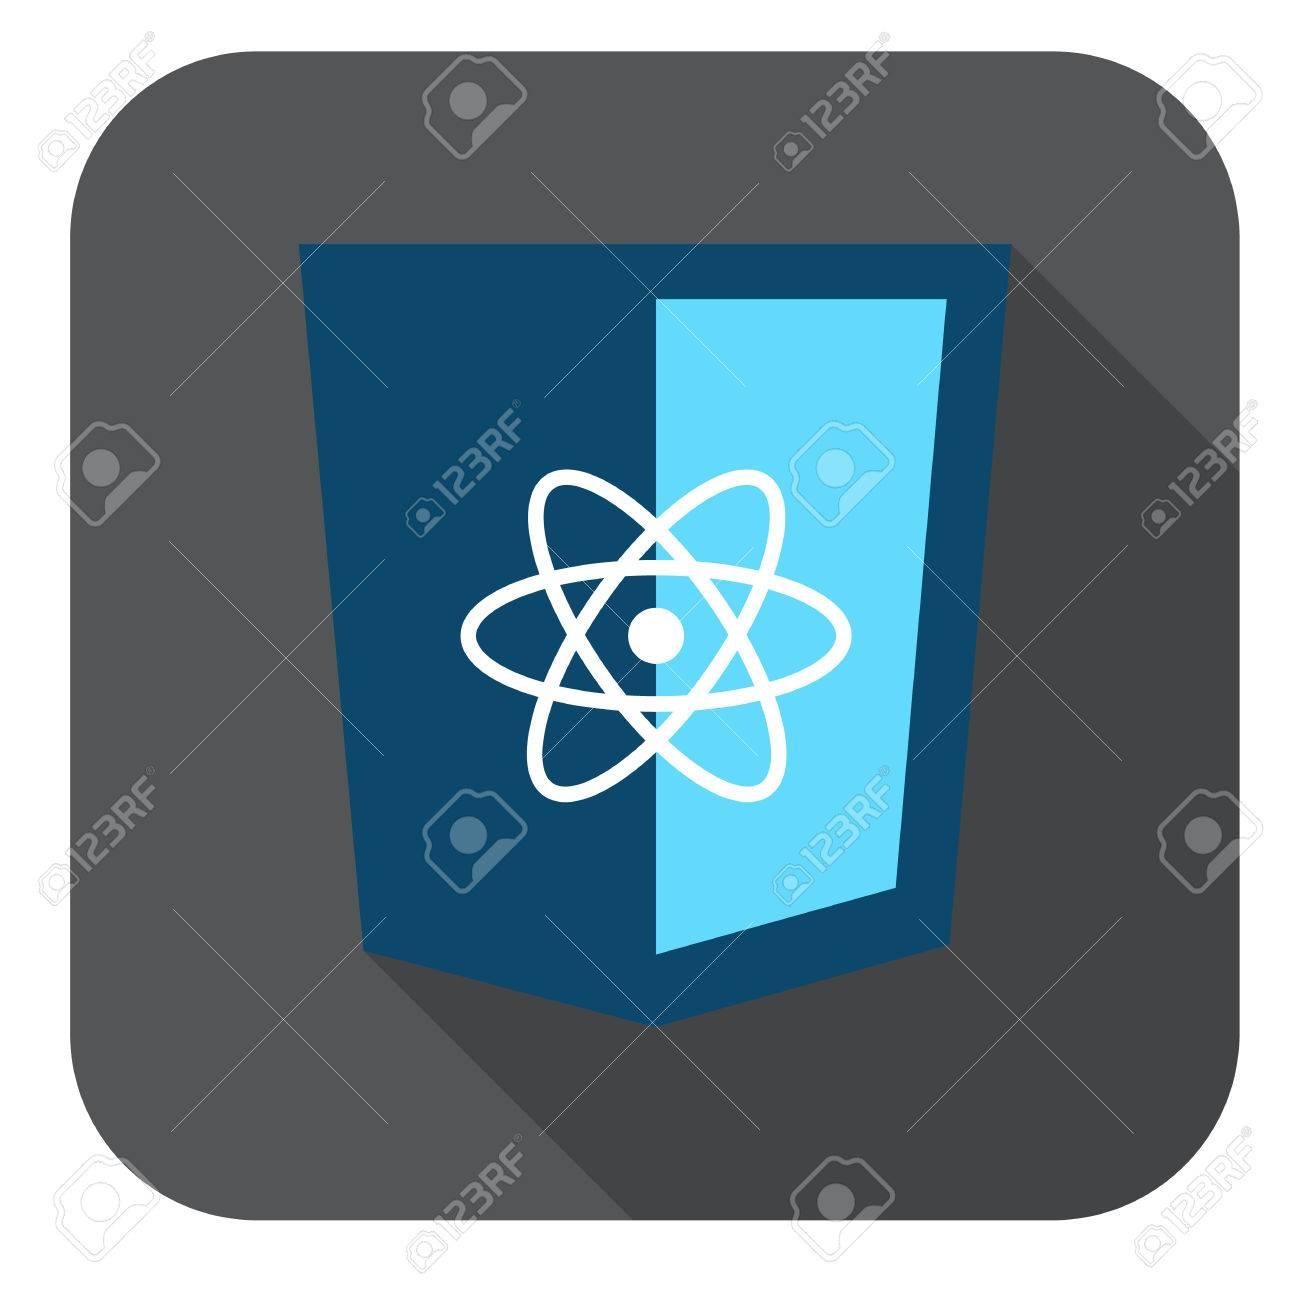 Vektor-Symbol-Blau Js Rahmen Web Shield - Isoliert Flache Design ...